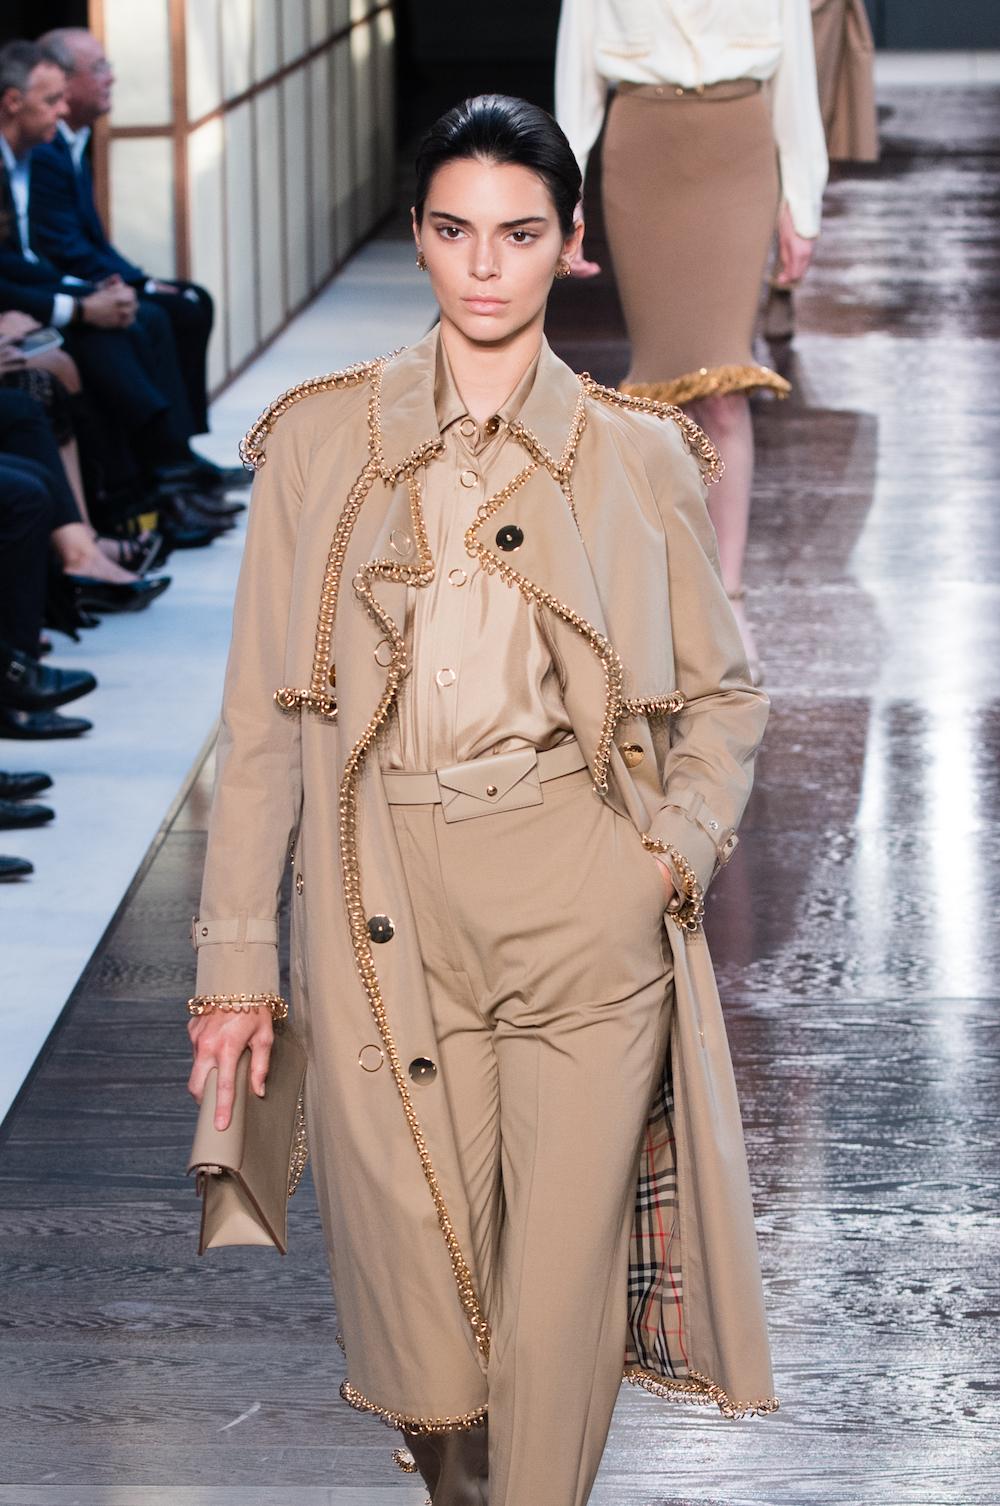 High End Fashion Brands: 15 Top